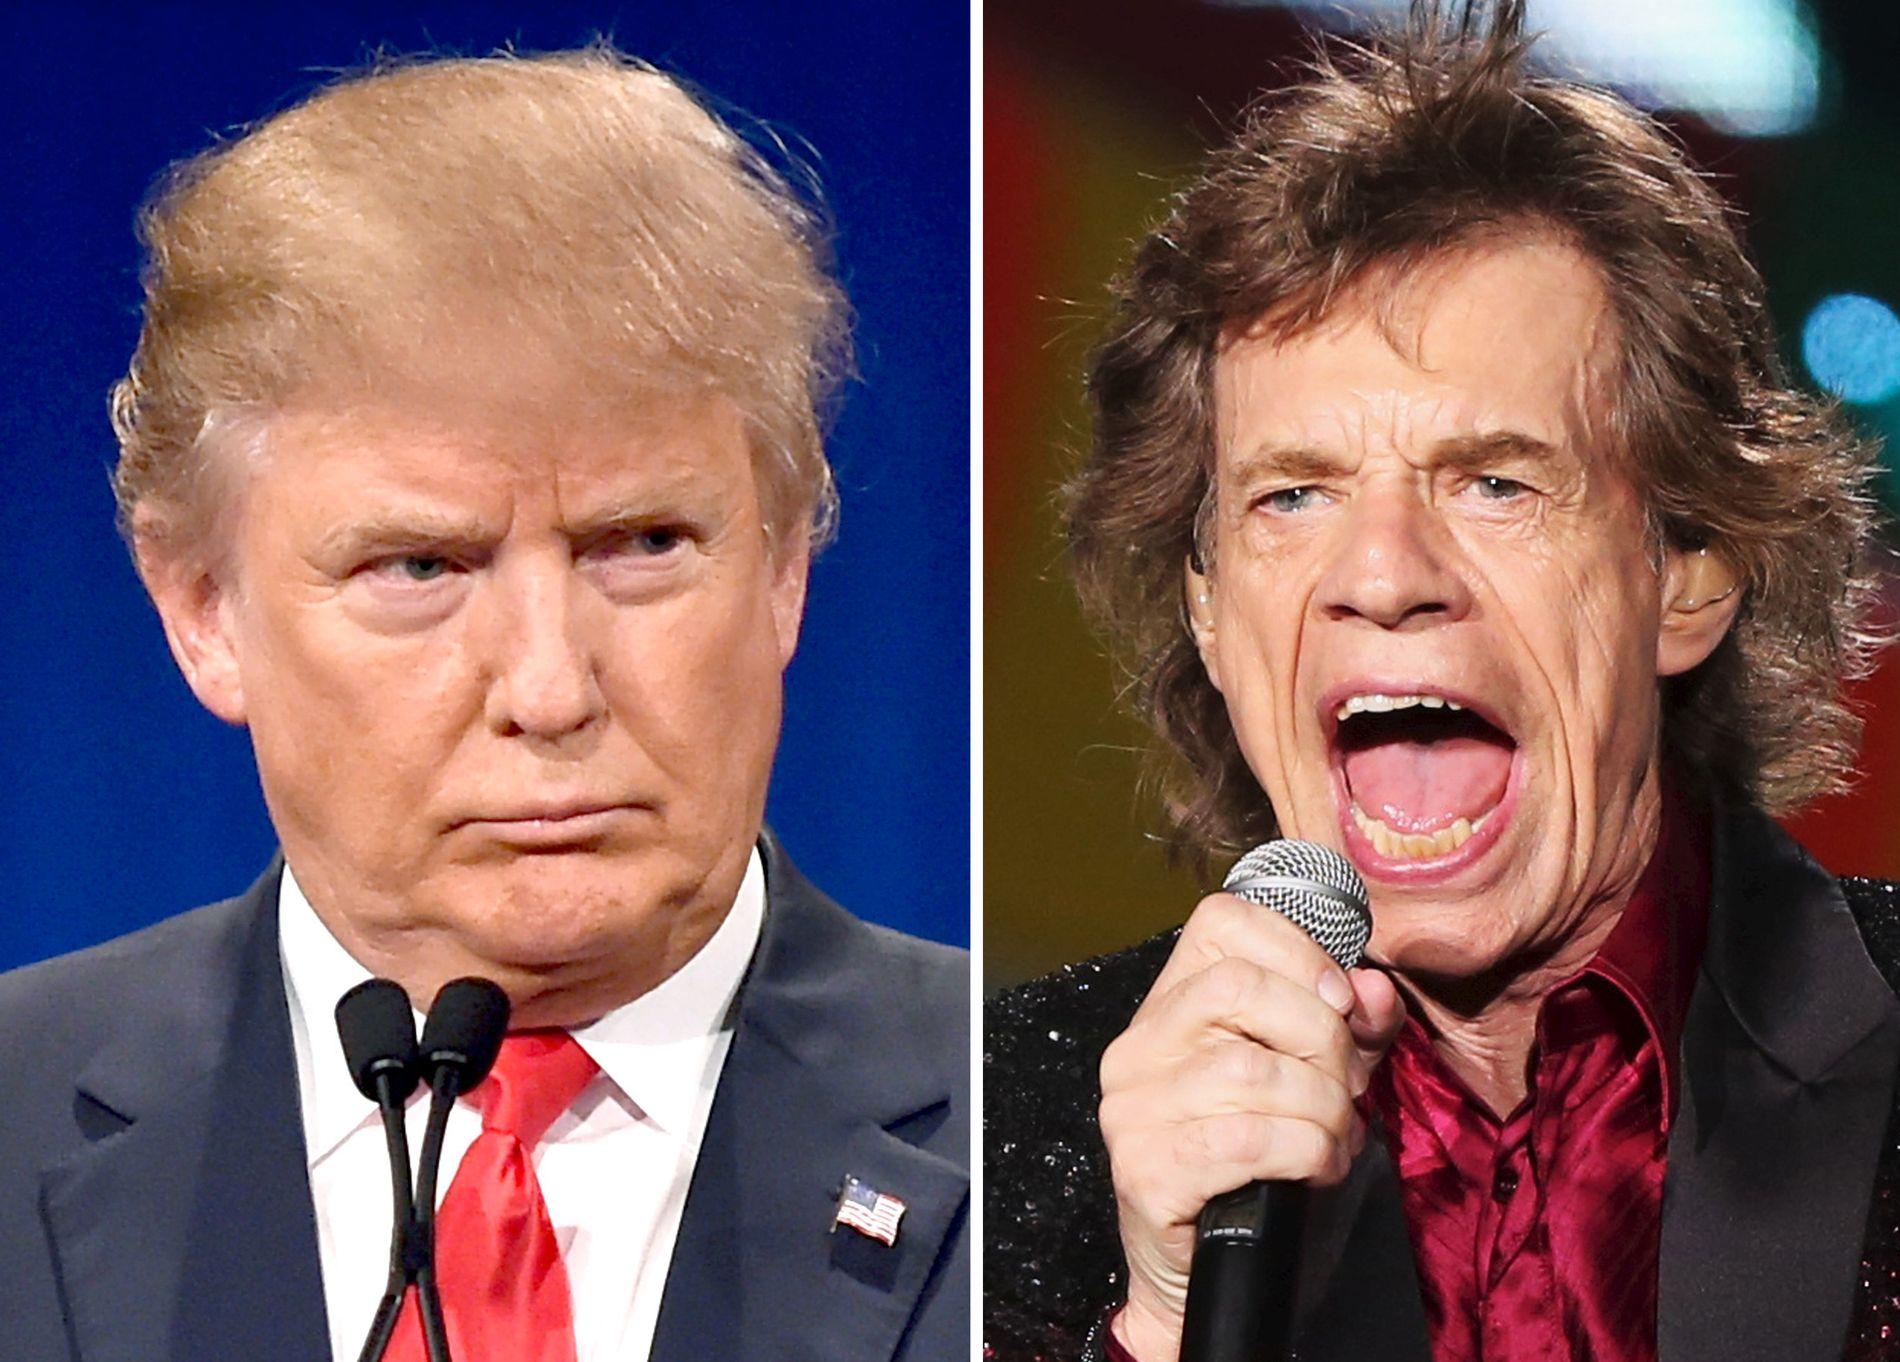 IKKE GJENSIDIG: Stones-vokalist Mick Jagger (t.h.) vil ha seg frabedt at Donald Trump spiller låtene deres.